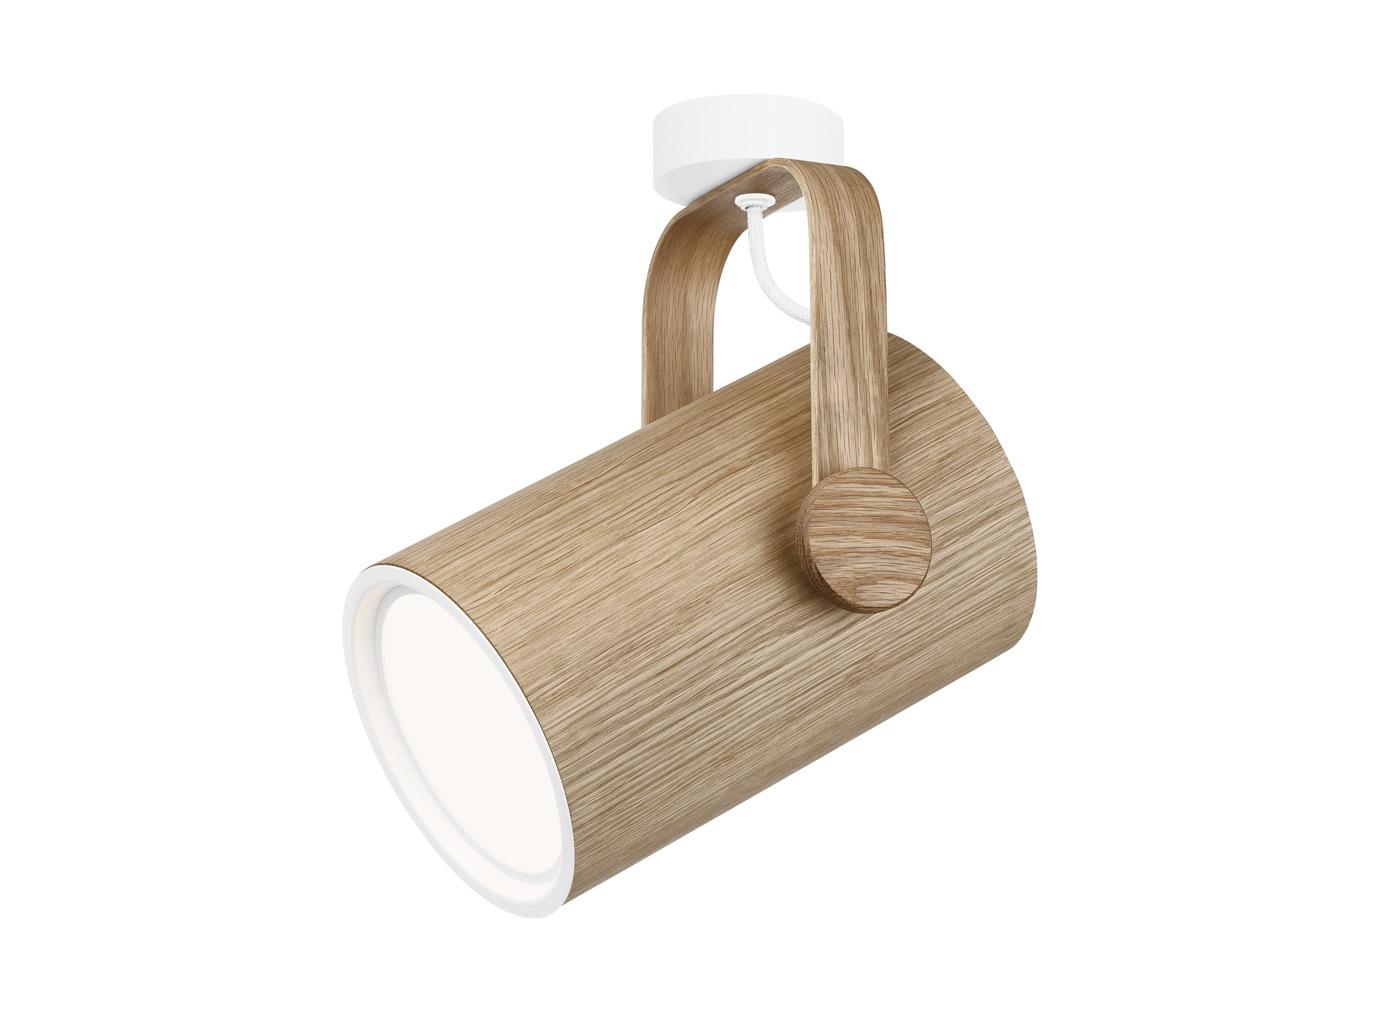 woodspotoak